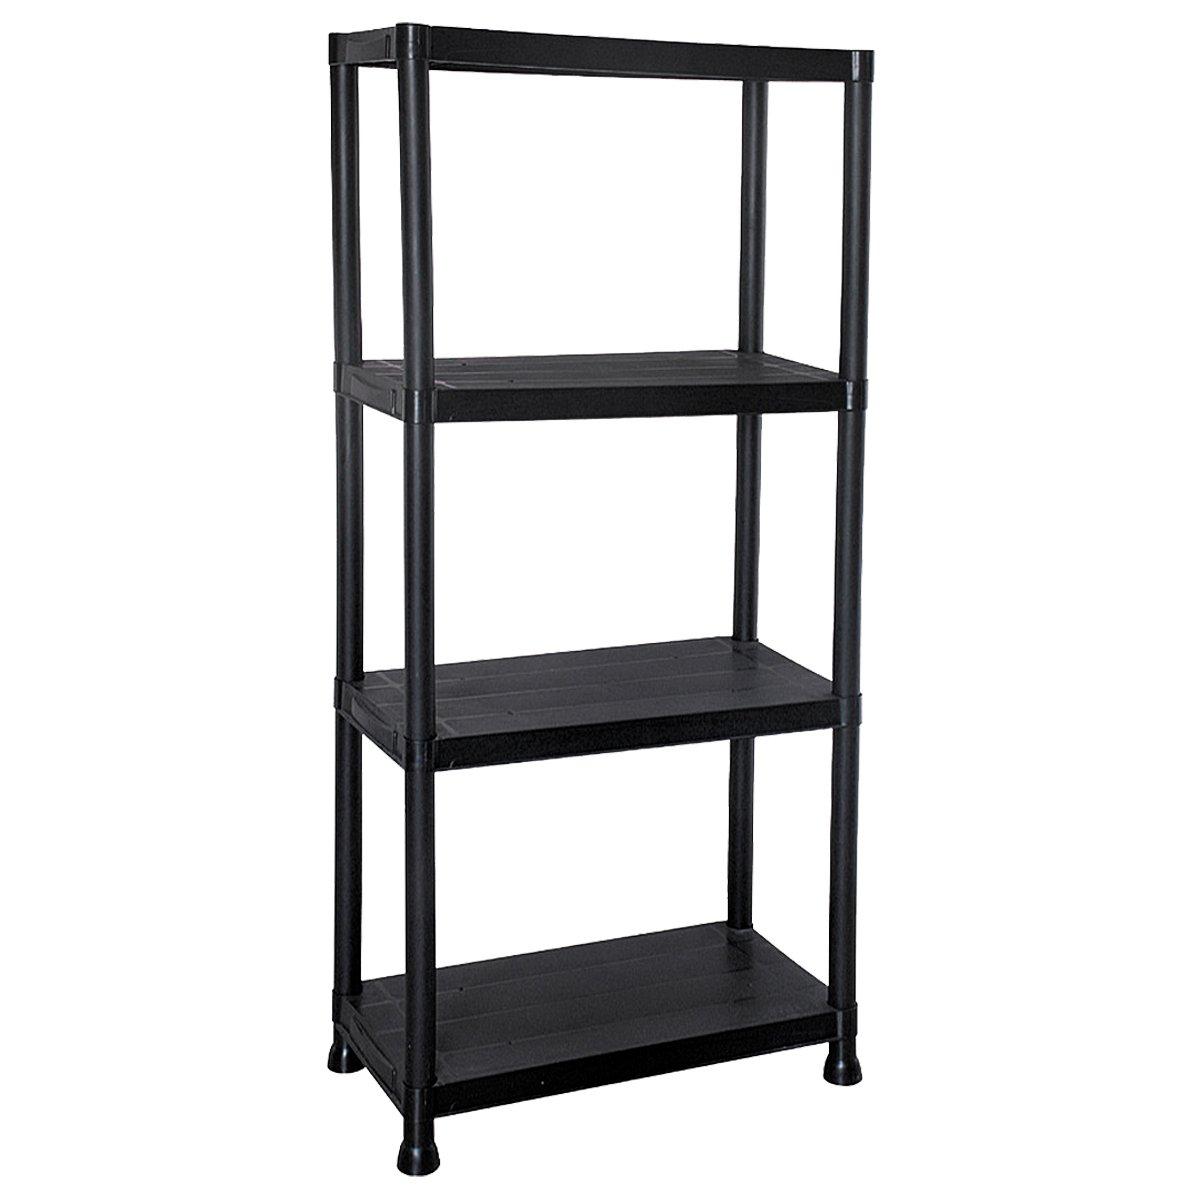 2x 4 Tier Black Plastic Shelving Unit Storage Shelves Garage Shop Warehouse Shed Marko